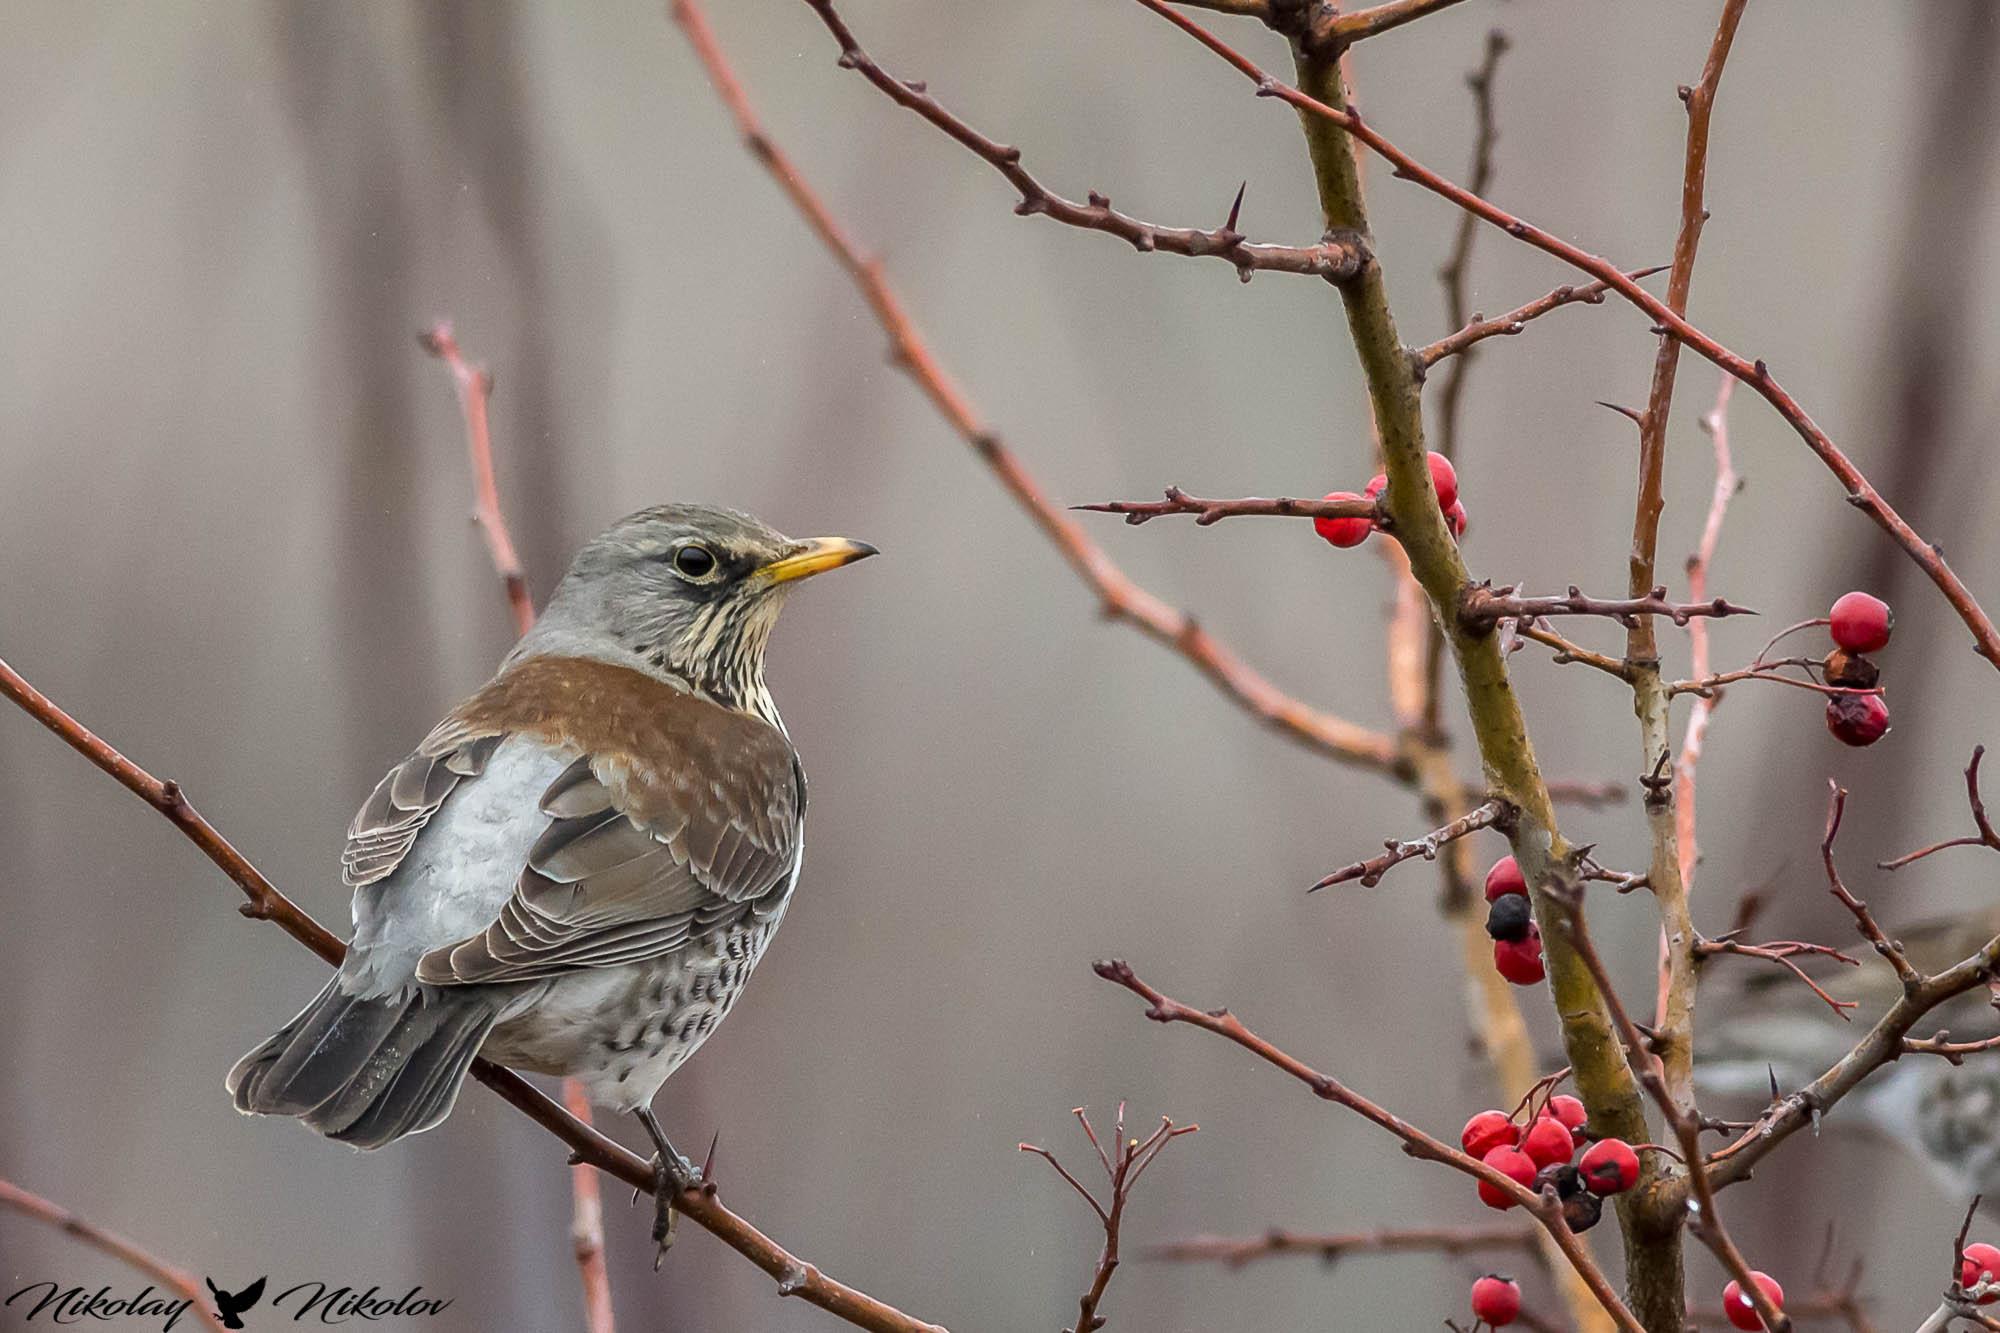 fieldfare,bird,winter,red,wings,wildlife,nature,landscape, Nikolay Nikolov